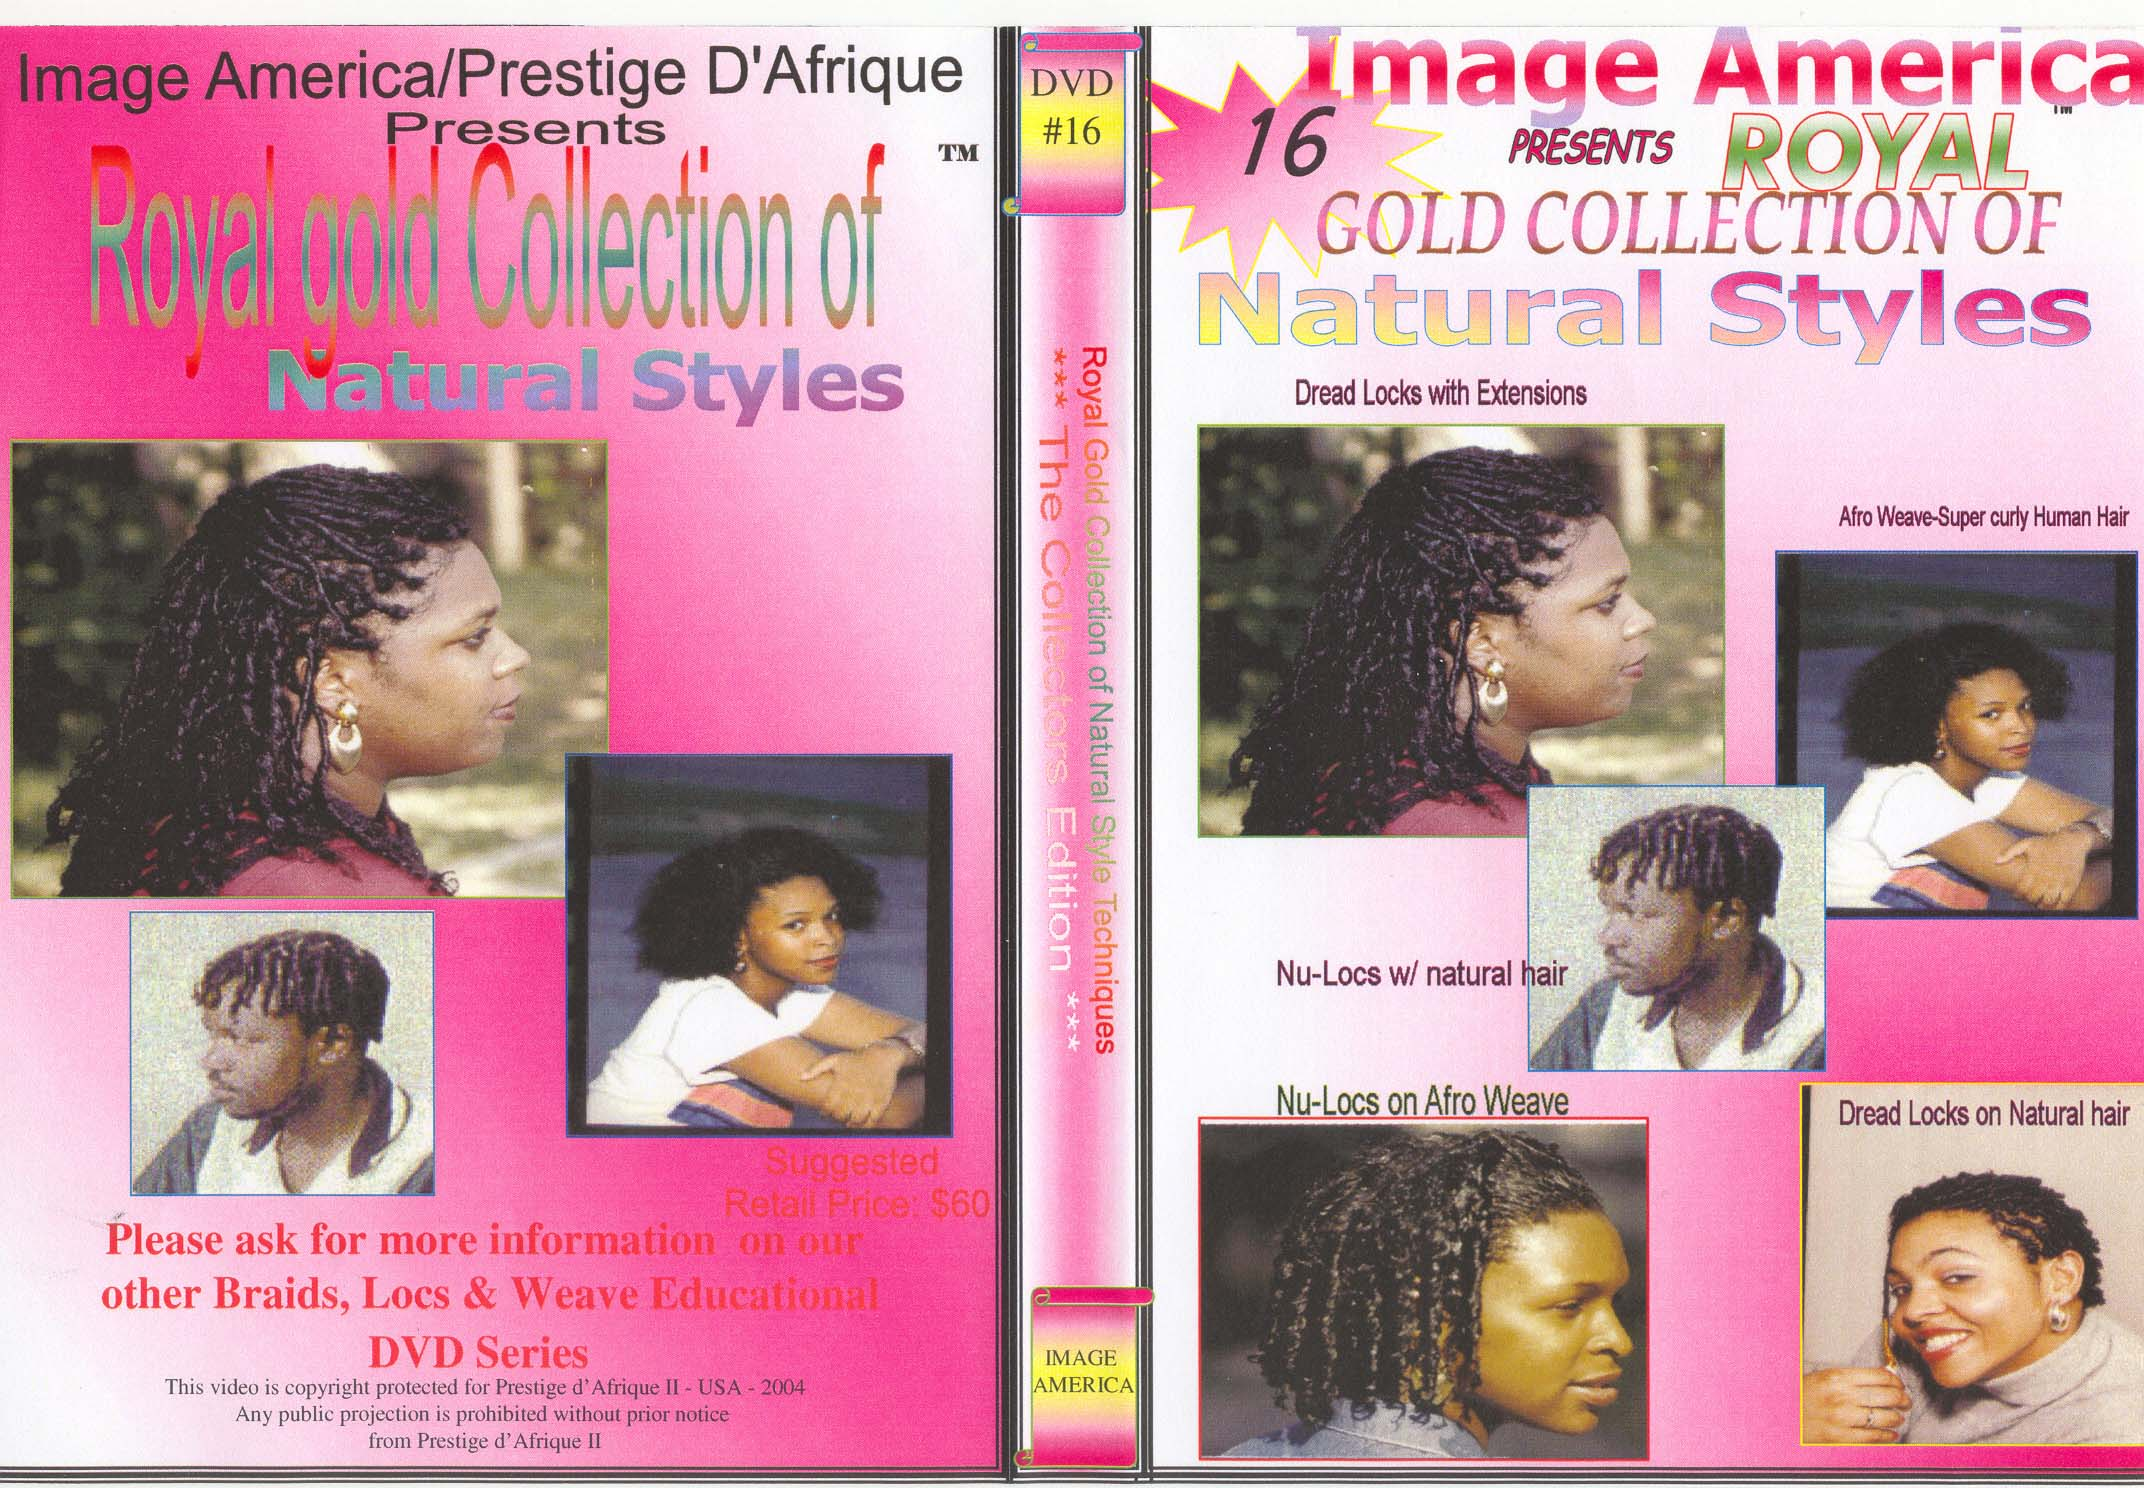 V16 Image America